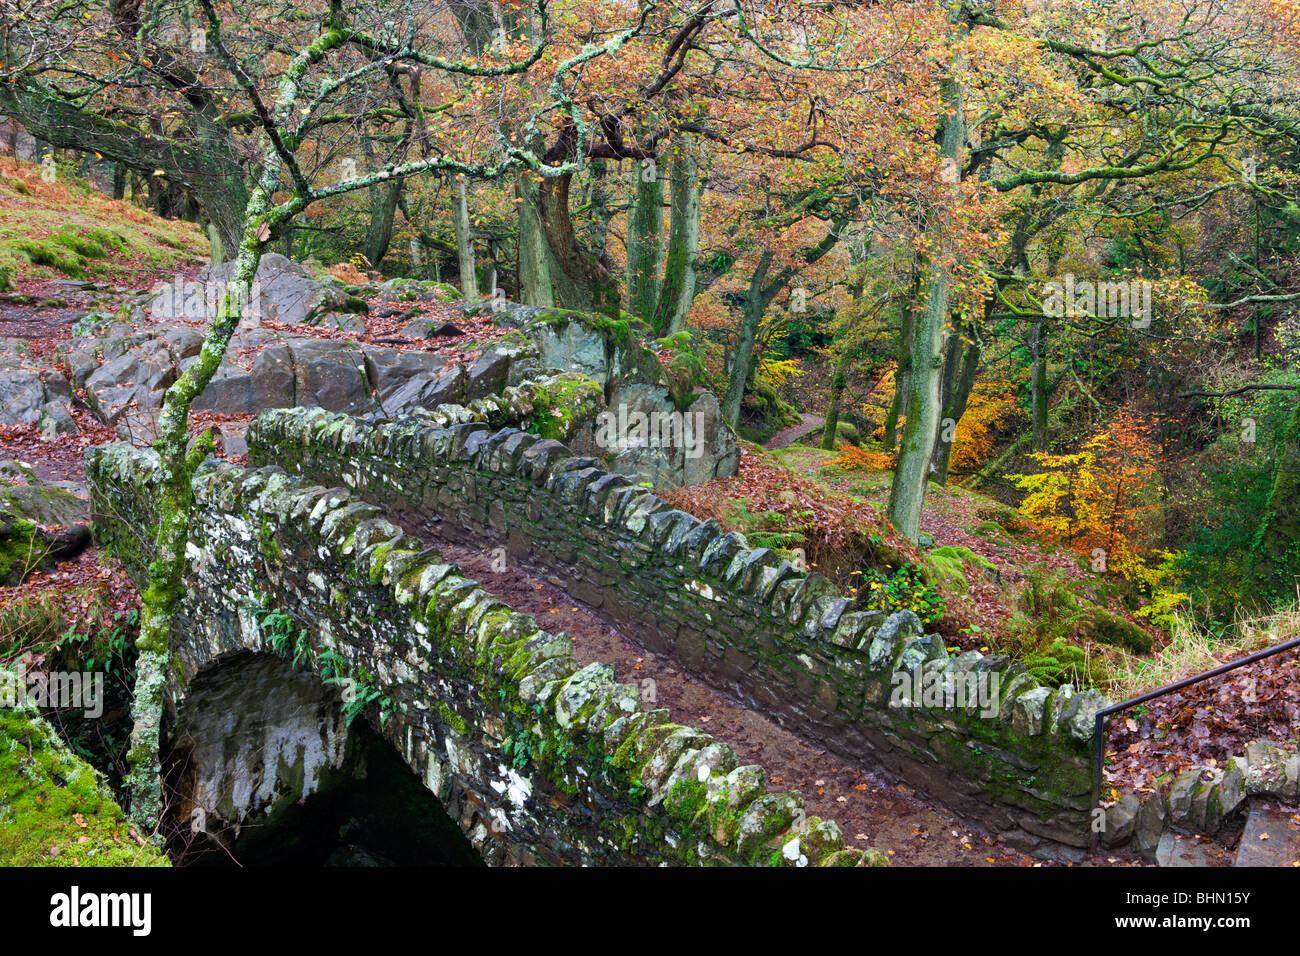 Stone bridge crossing Aira Force waterfall, Lake District National Park, Cumbria, England, UK. Autumn (November) - Stock Image